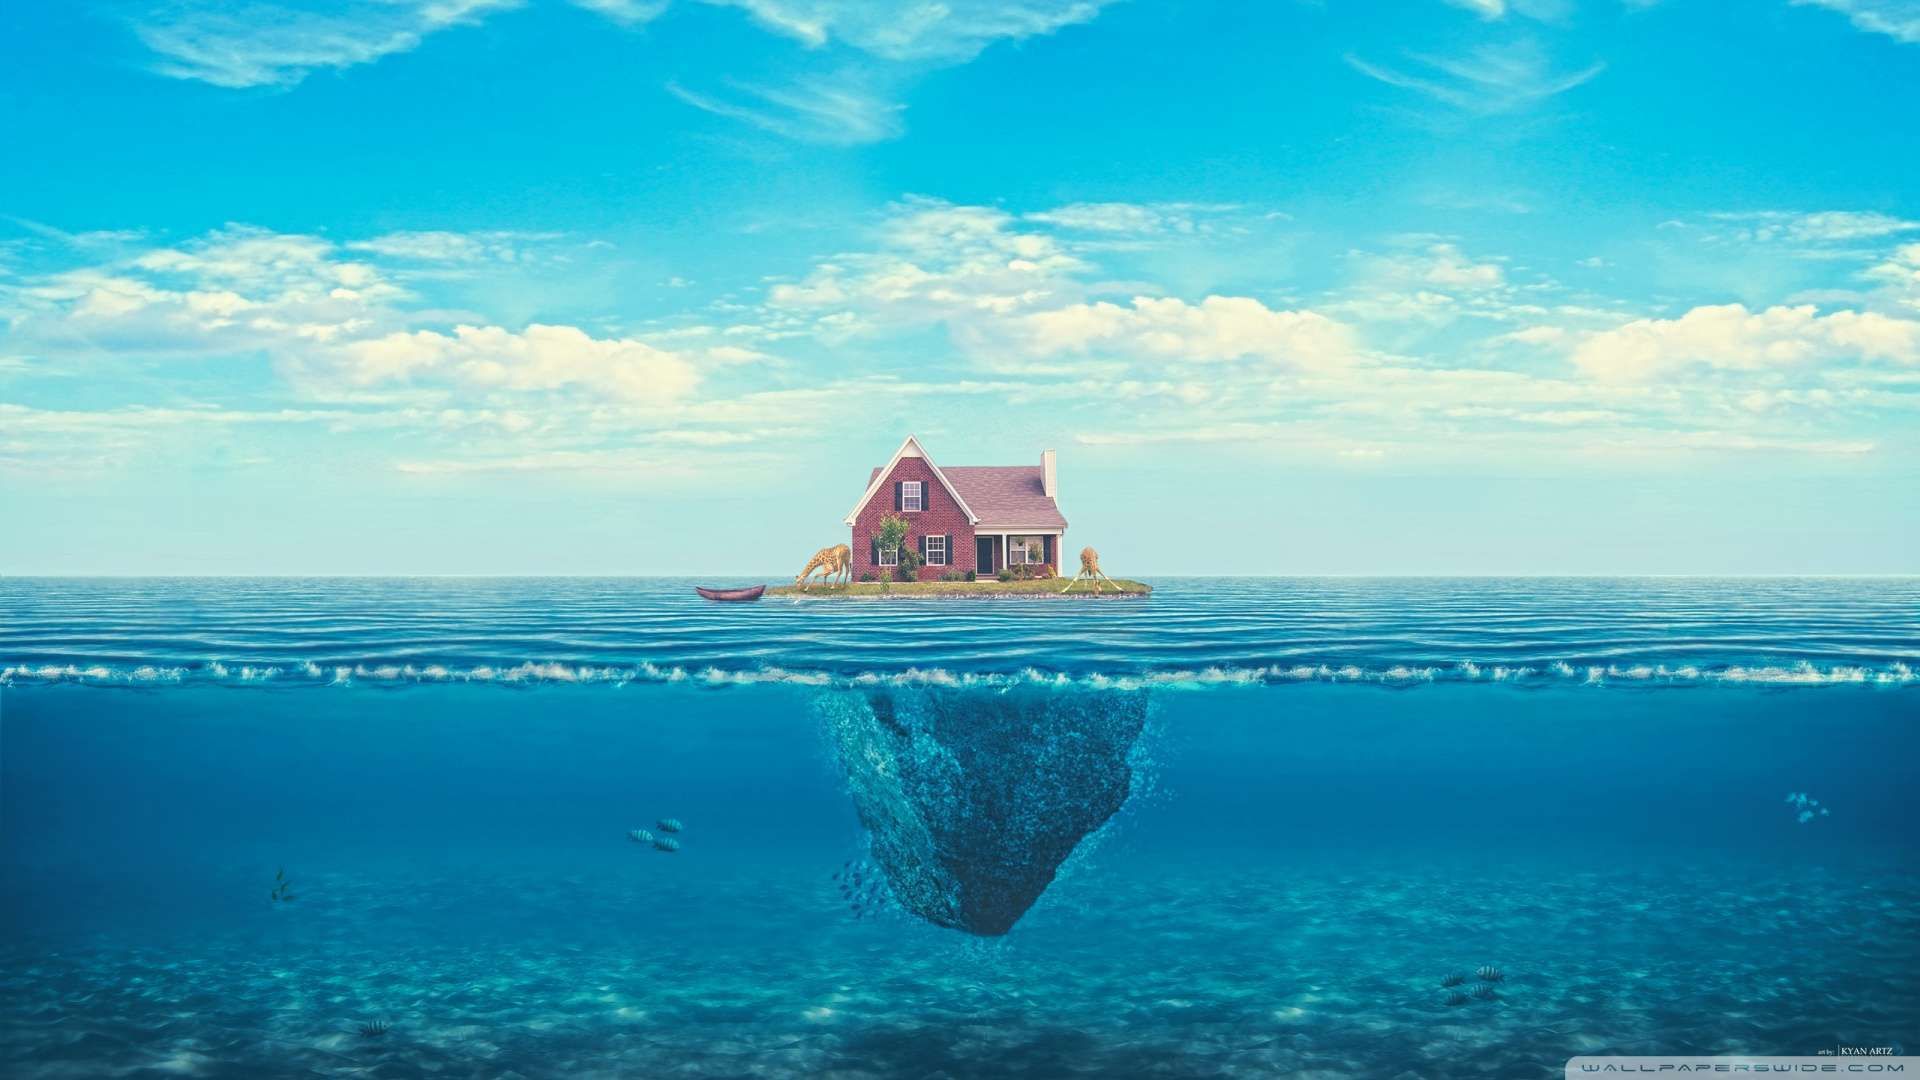 Wallpaper House On The Ocean Wallpaper 1080p HD Upload at December 1920x1080